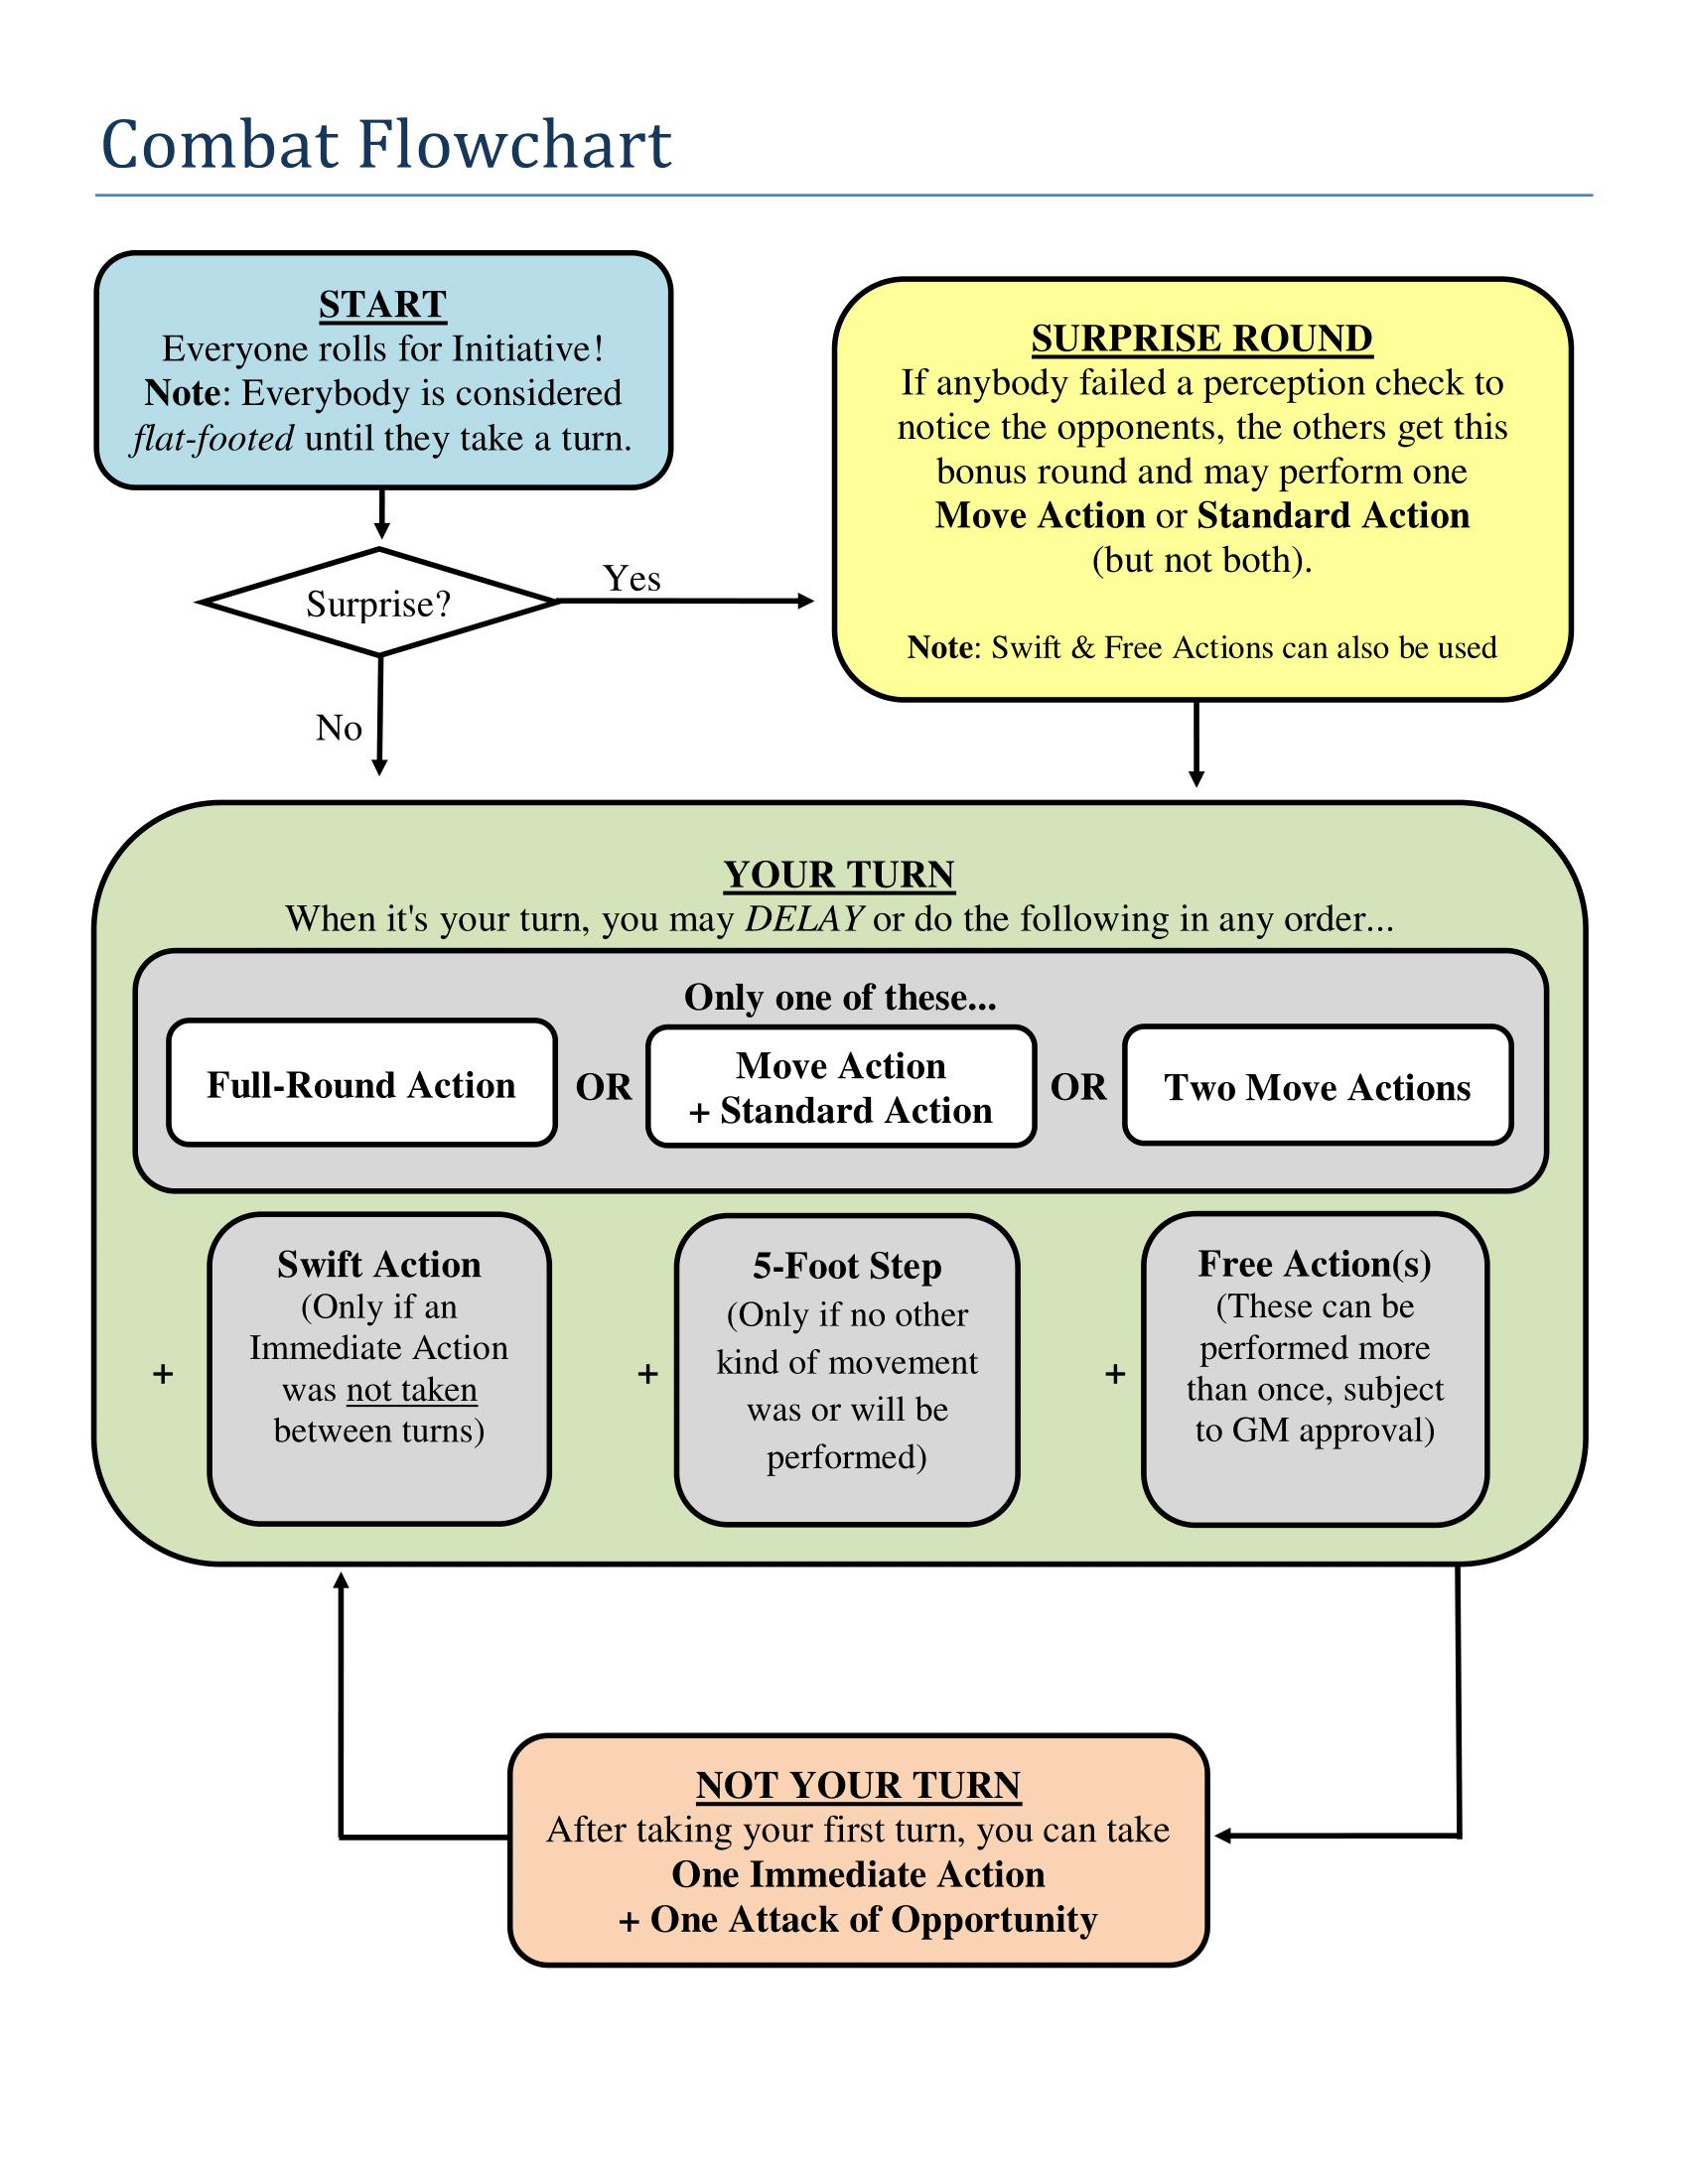 aid - PF Combat Flowchart